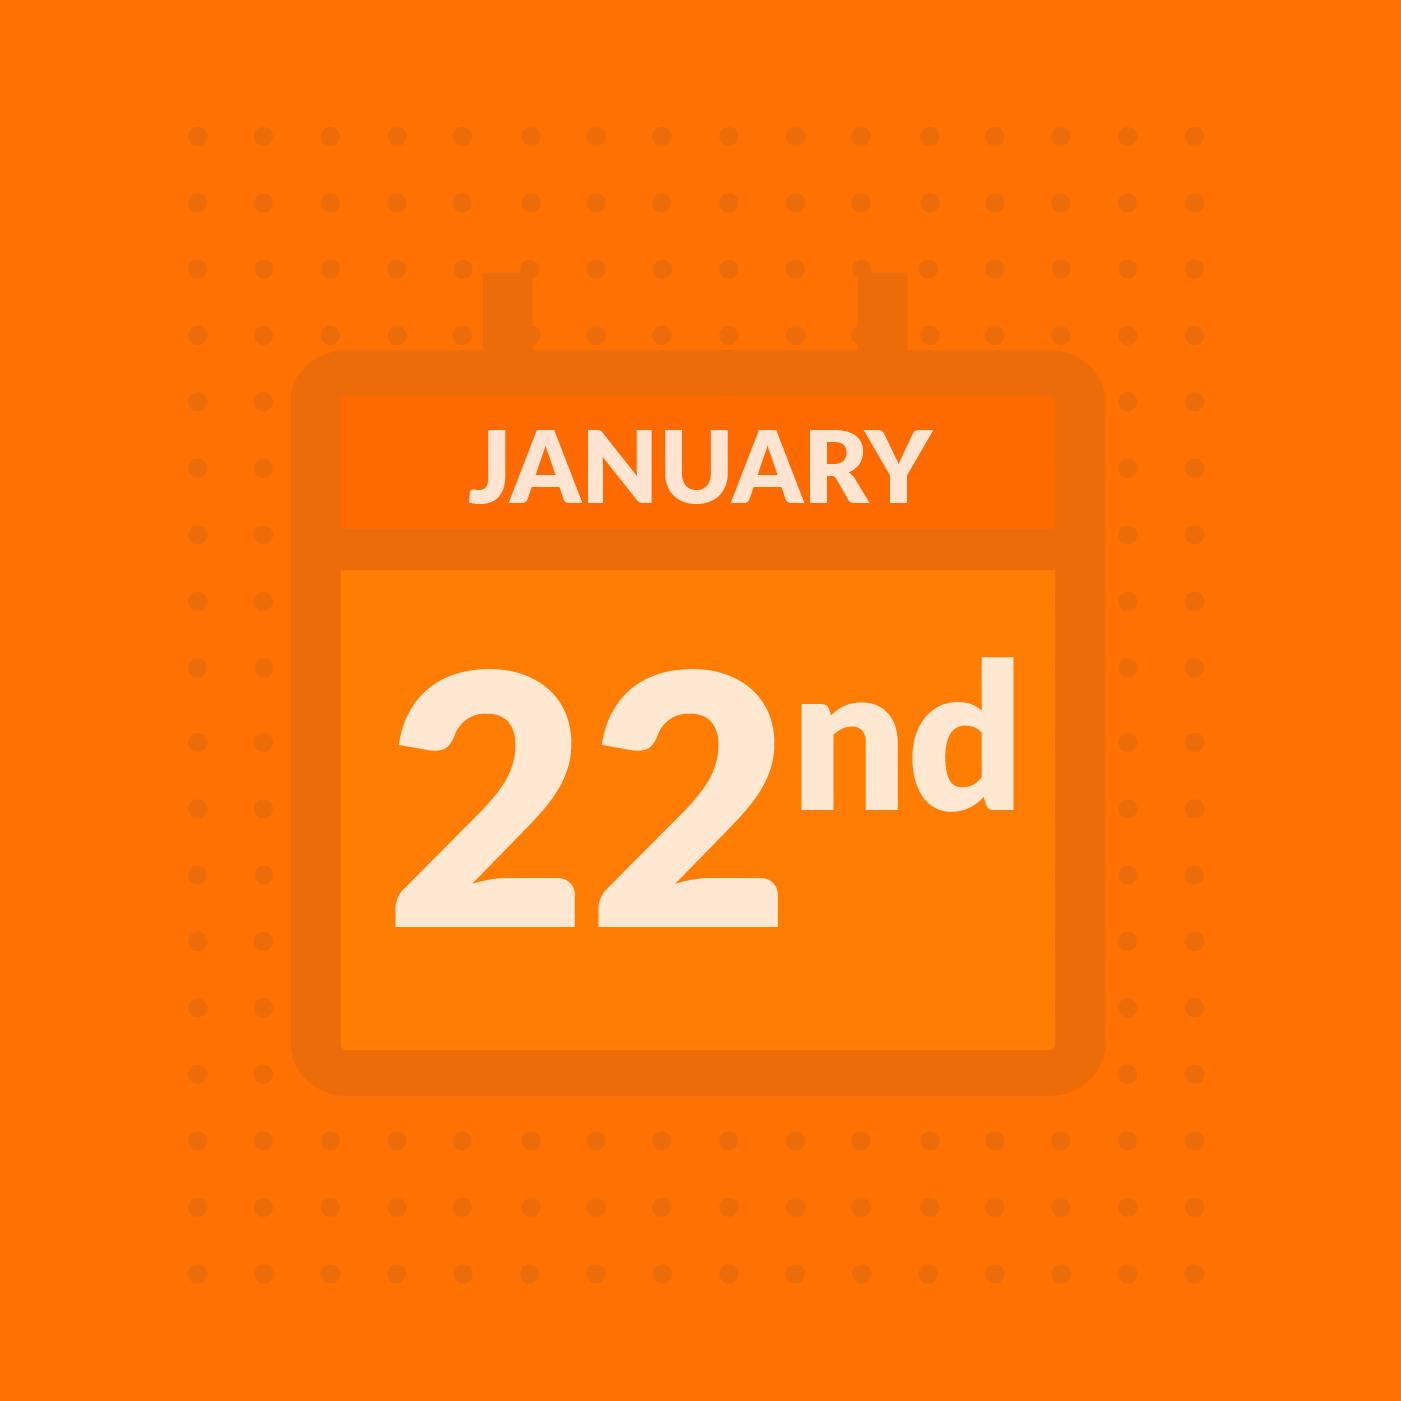 Jan. 22nd: BCH Fork Will Cut Block Rewards By 12.5 Percent